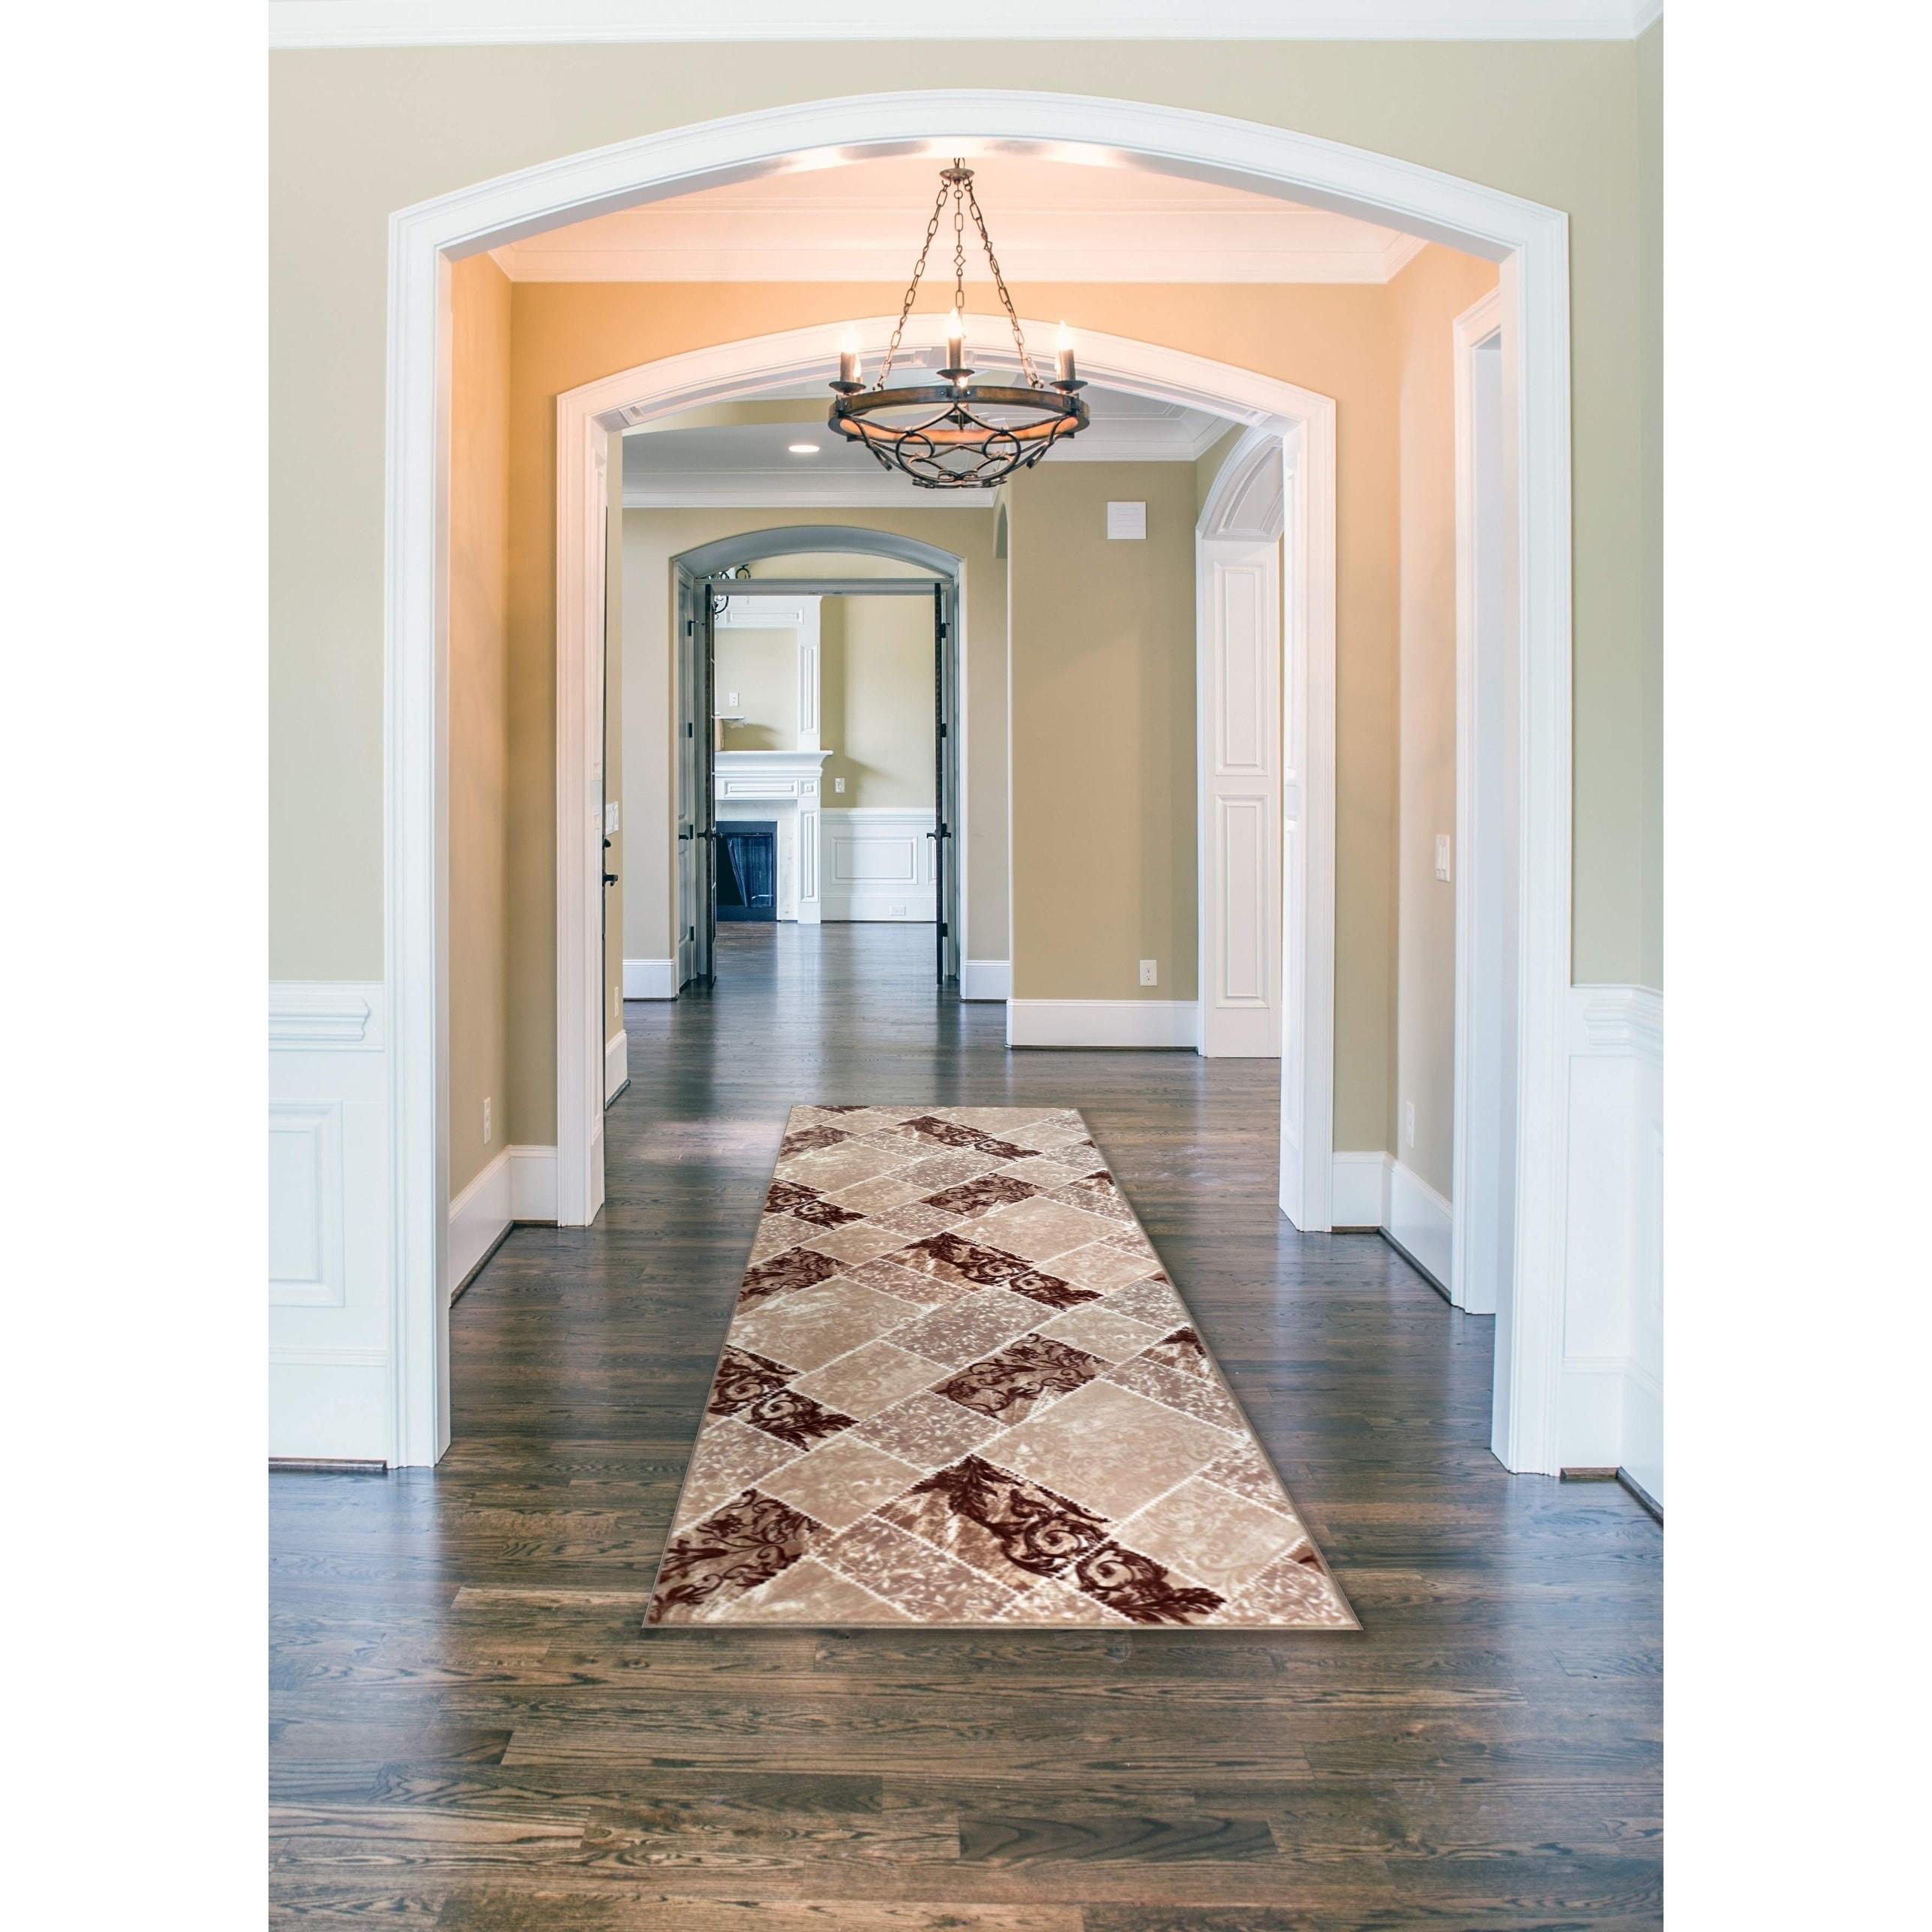 8 x 10 Area Rug Floor Carpet Tufted 100/% Olefin Non Skid Resistant Rubber Back